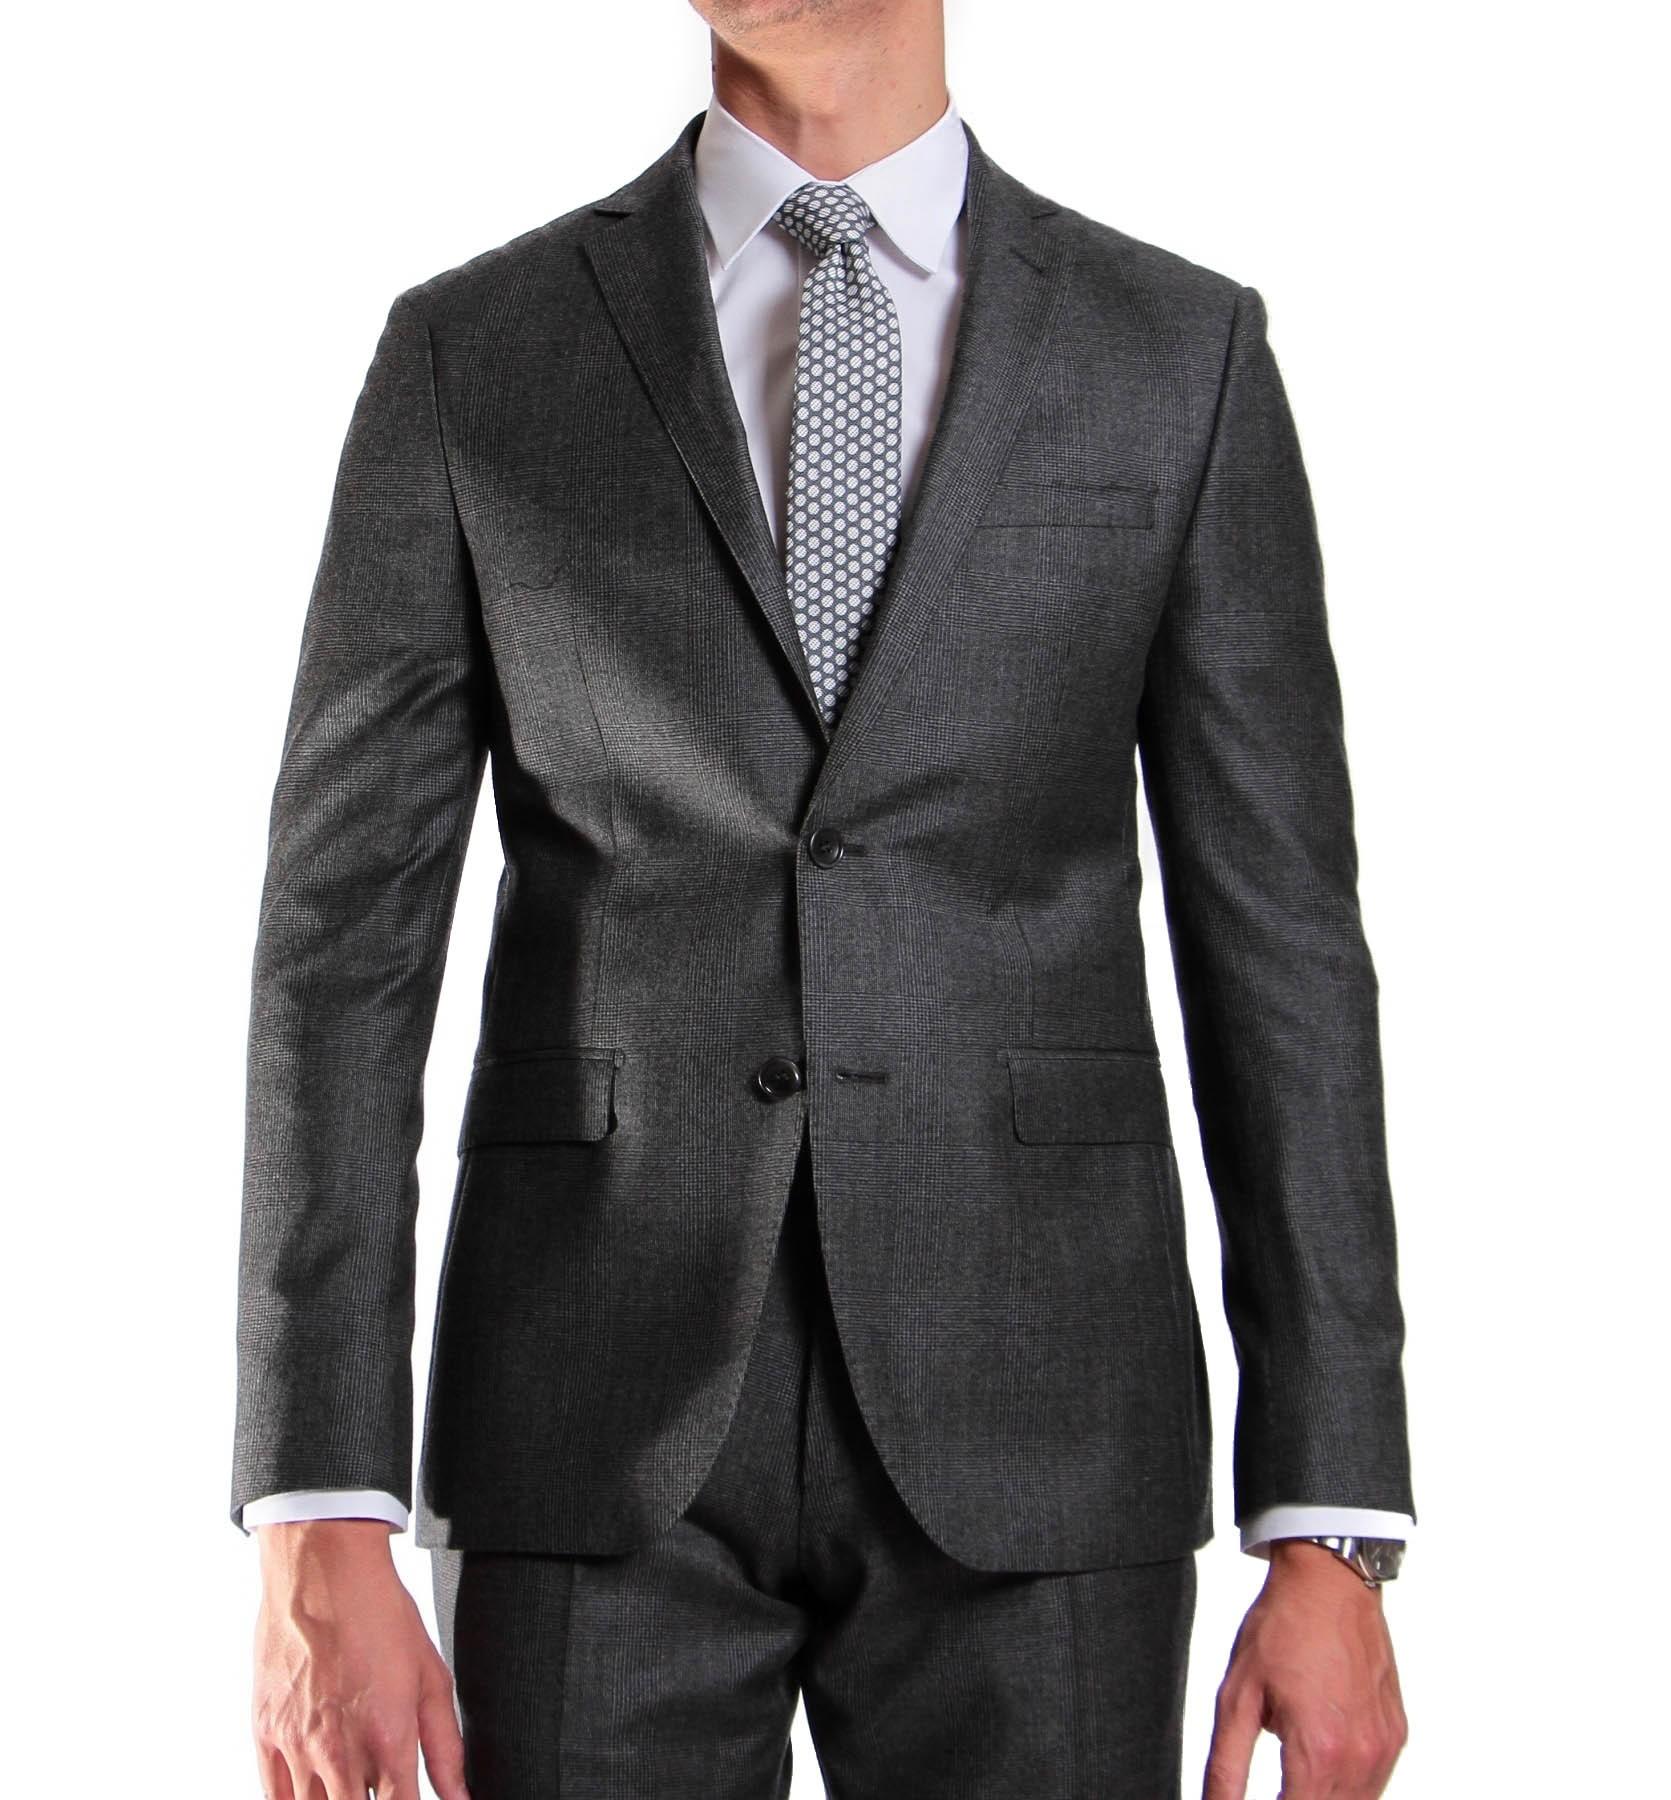 Costume Prince de Galles gris - Slim-Fit - Pure Laine - Tissu Canonico 110's